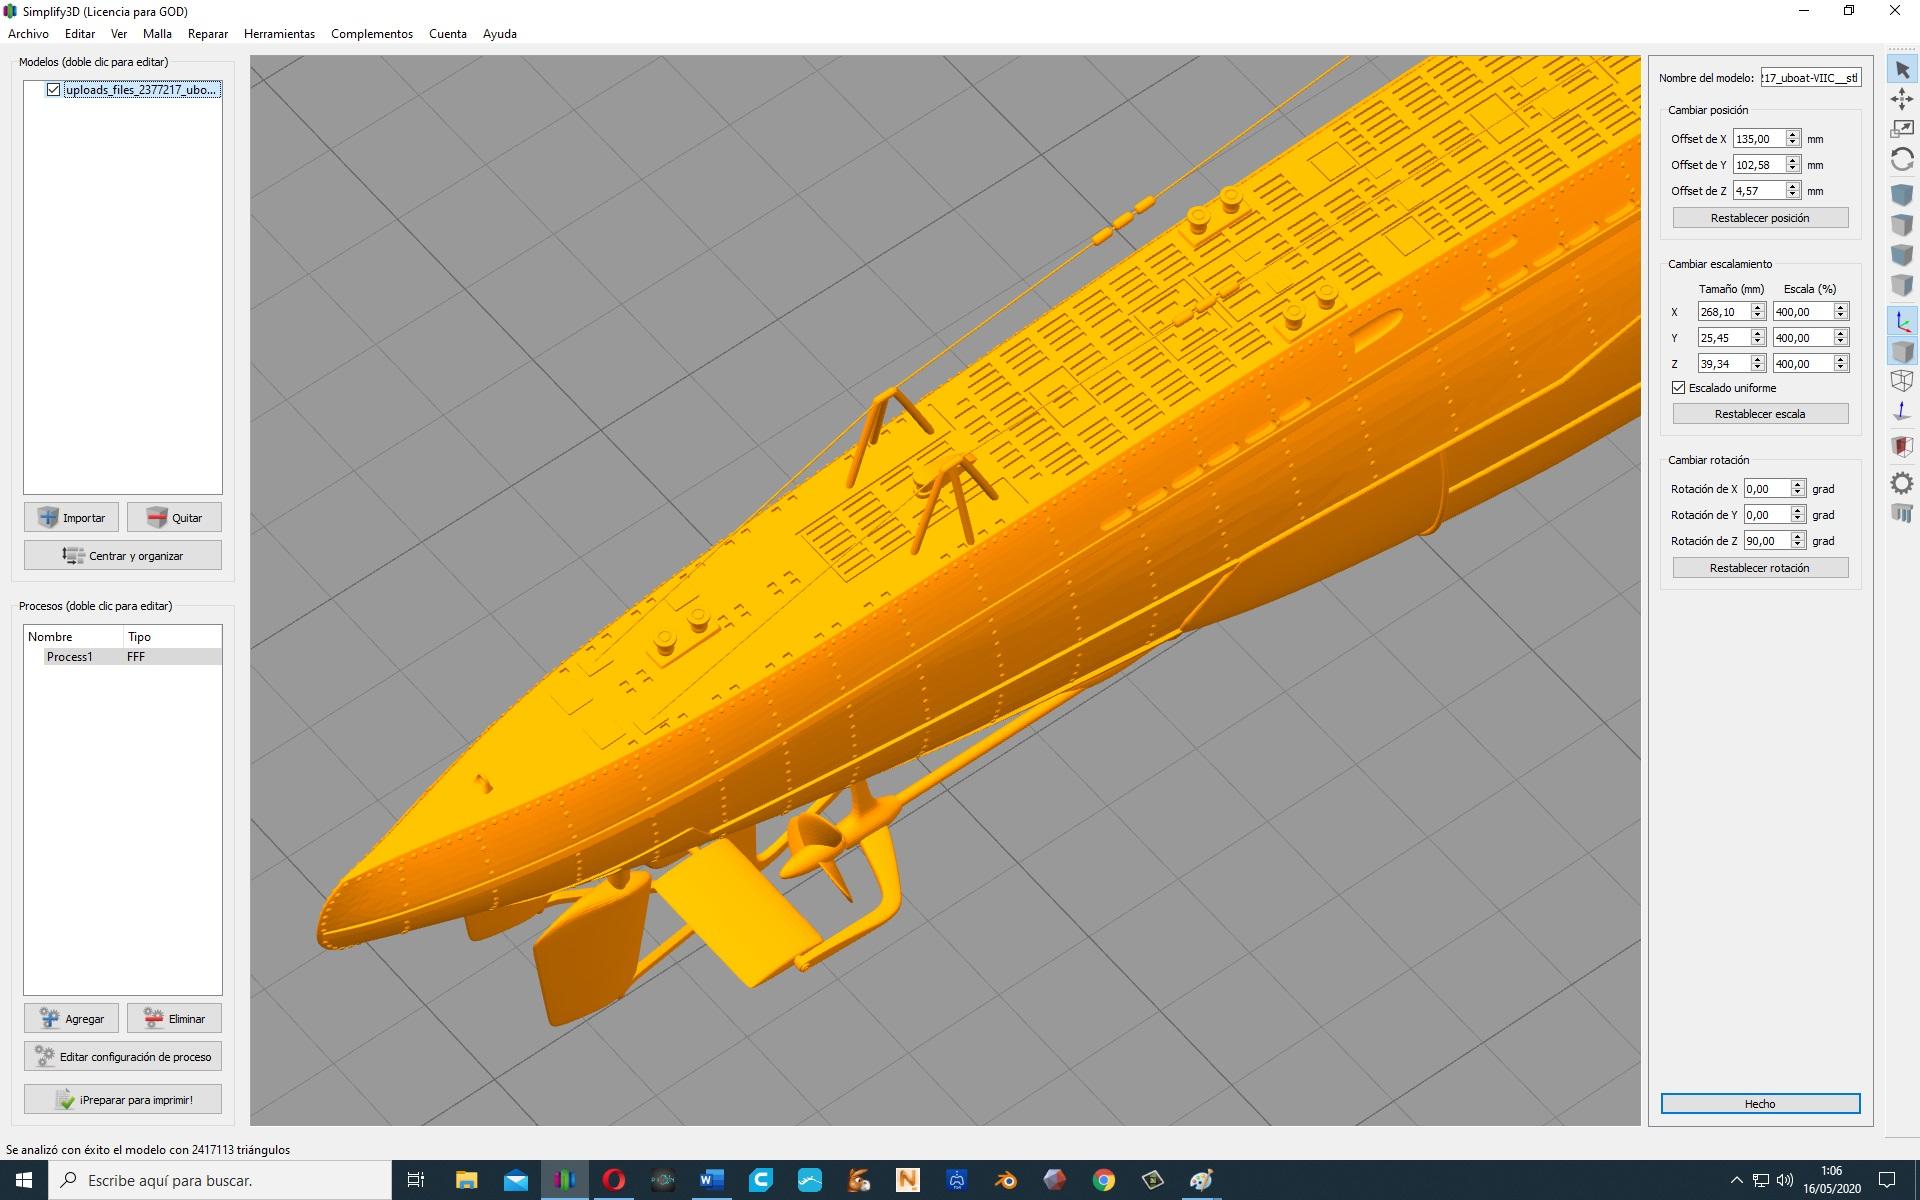 IMPRESSION 3D 317